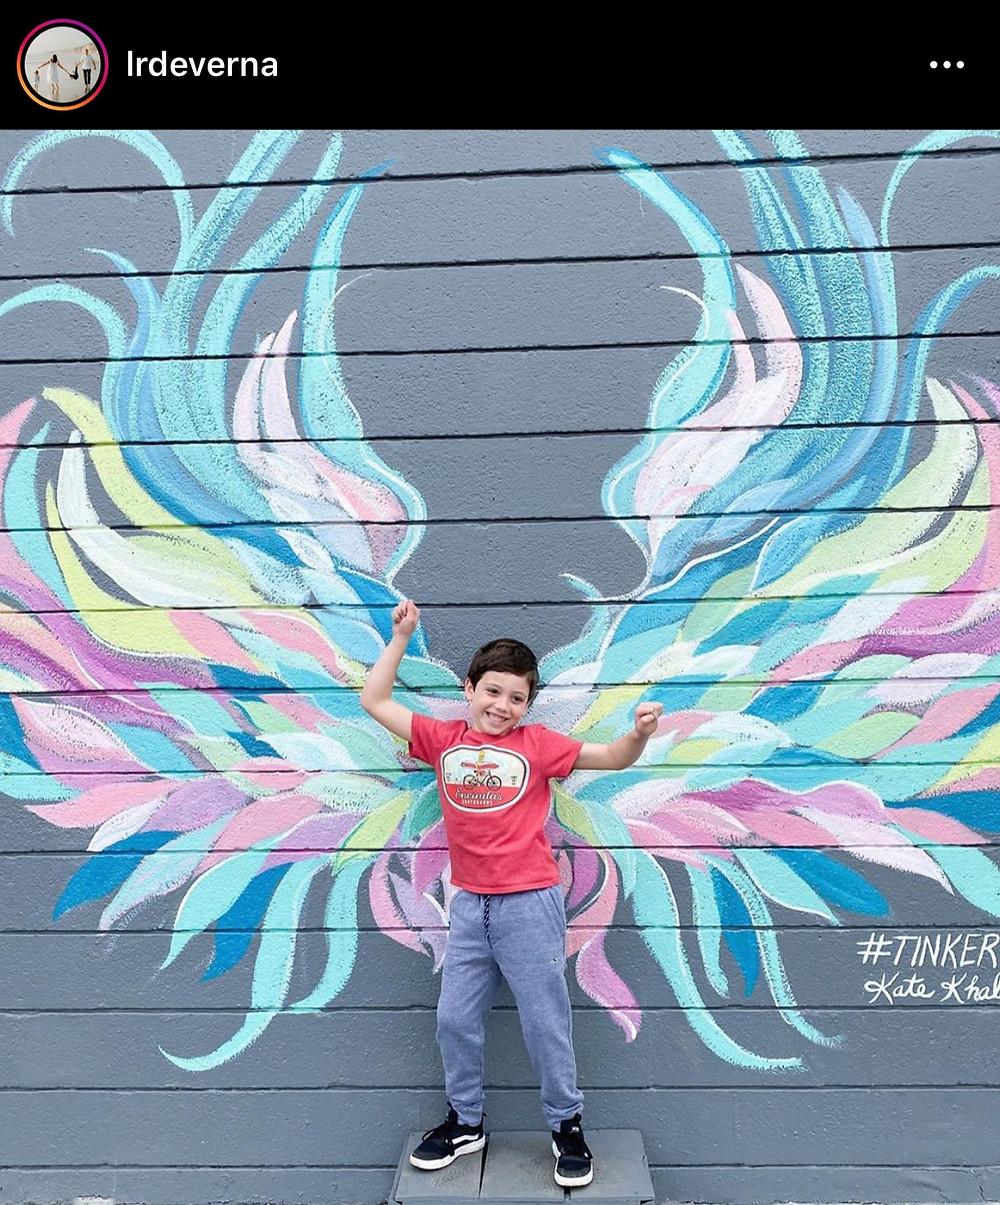 Tinker's Angel wing mural